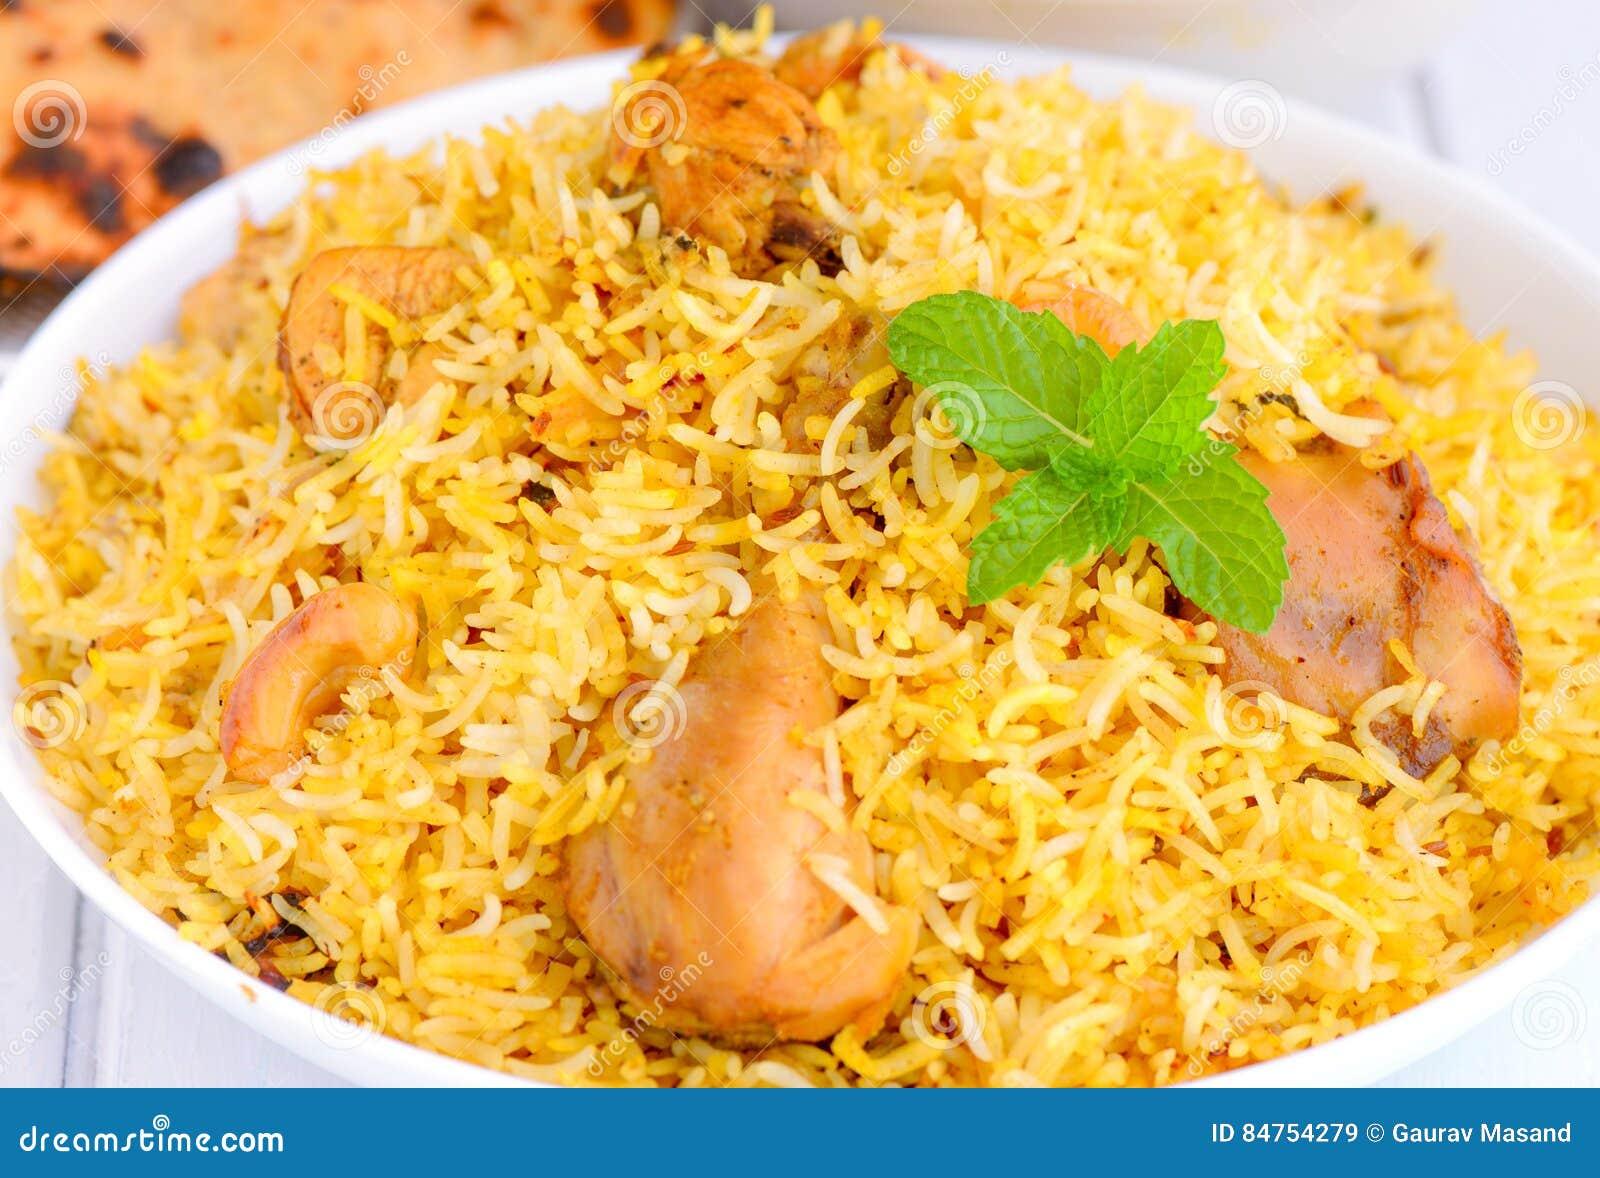 Free download sindhi dum biryani recipe archives sooperchef. Pk.